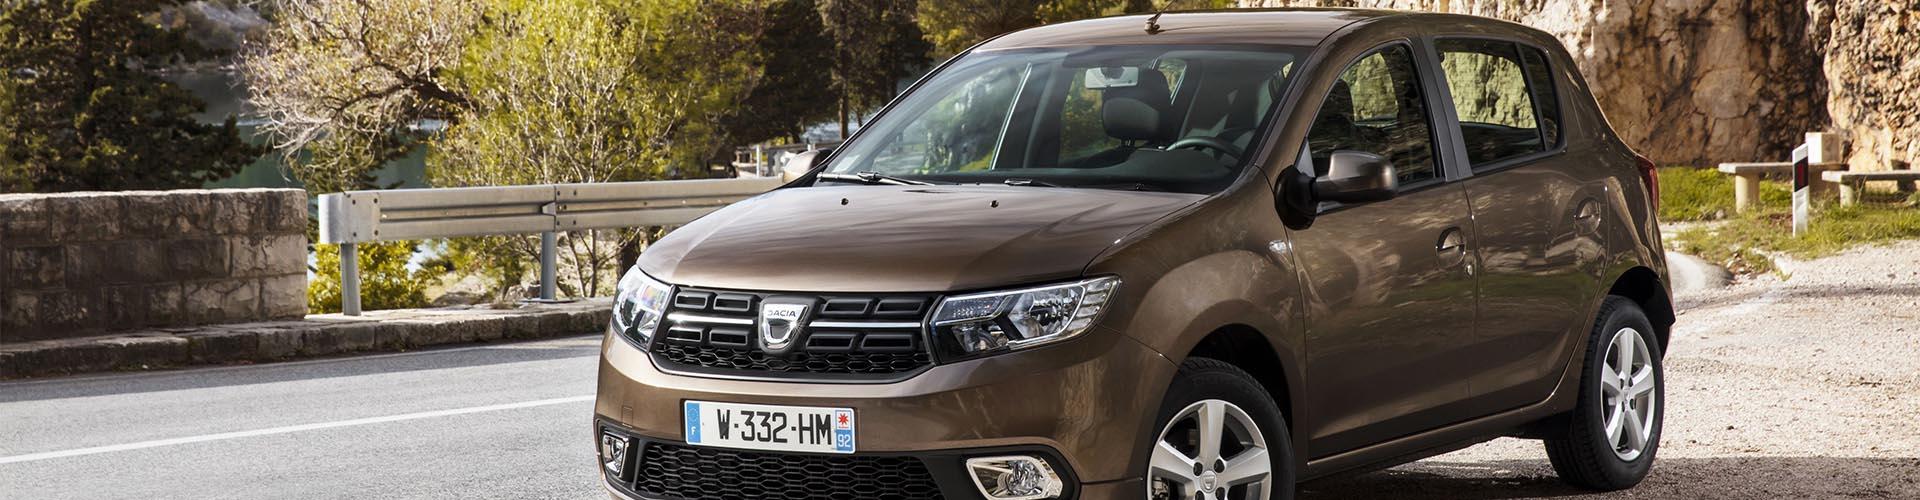 Dacia Sandero braun